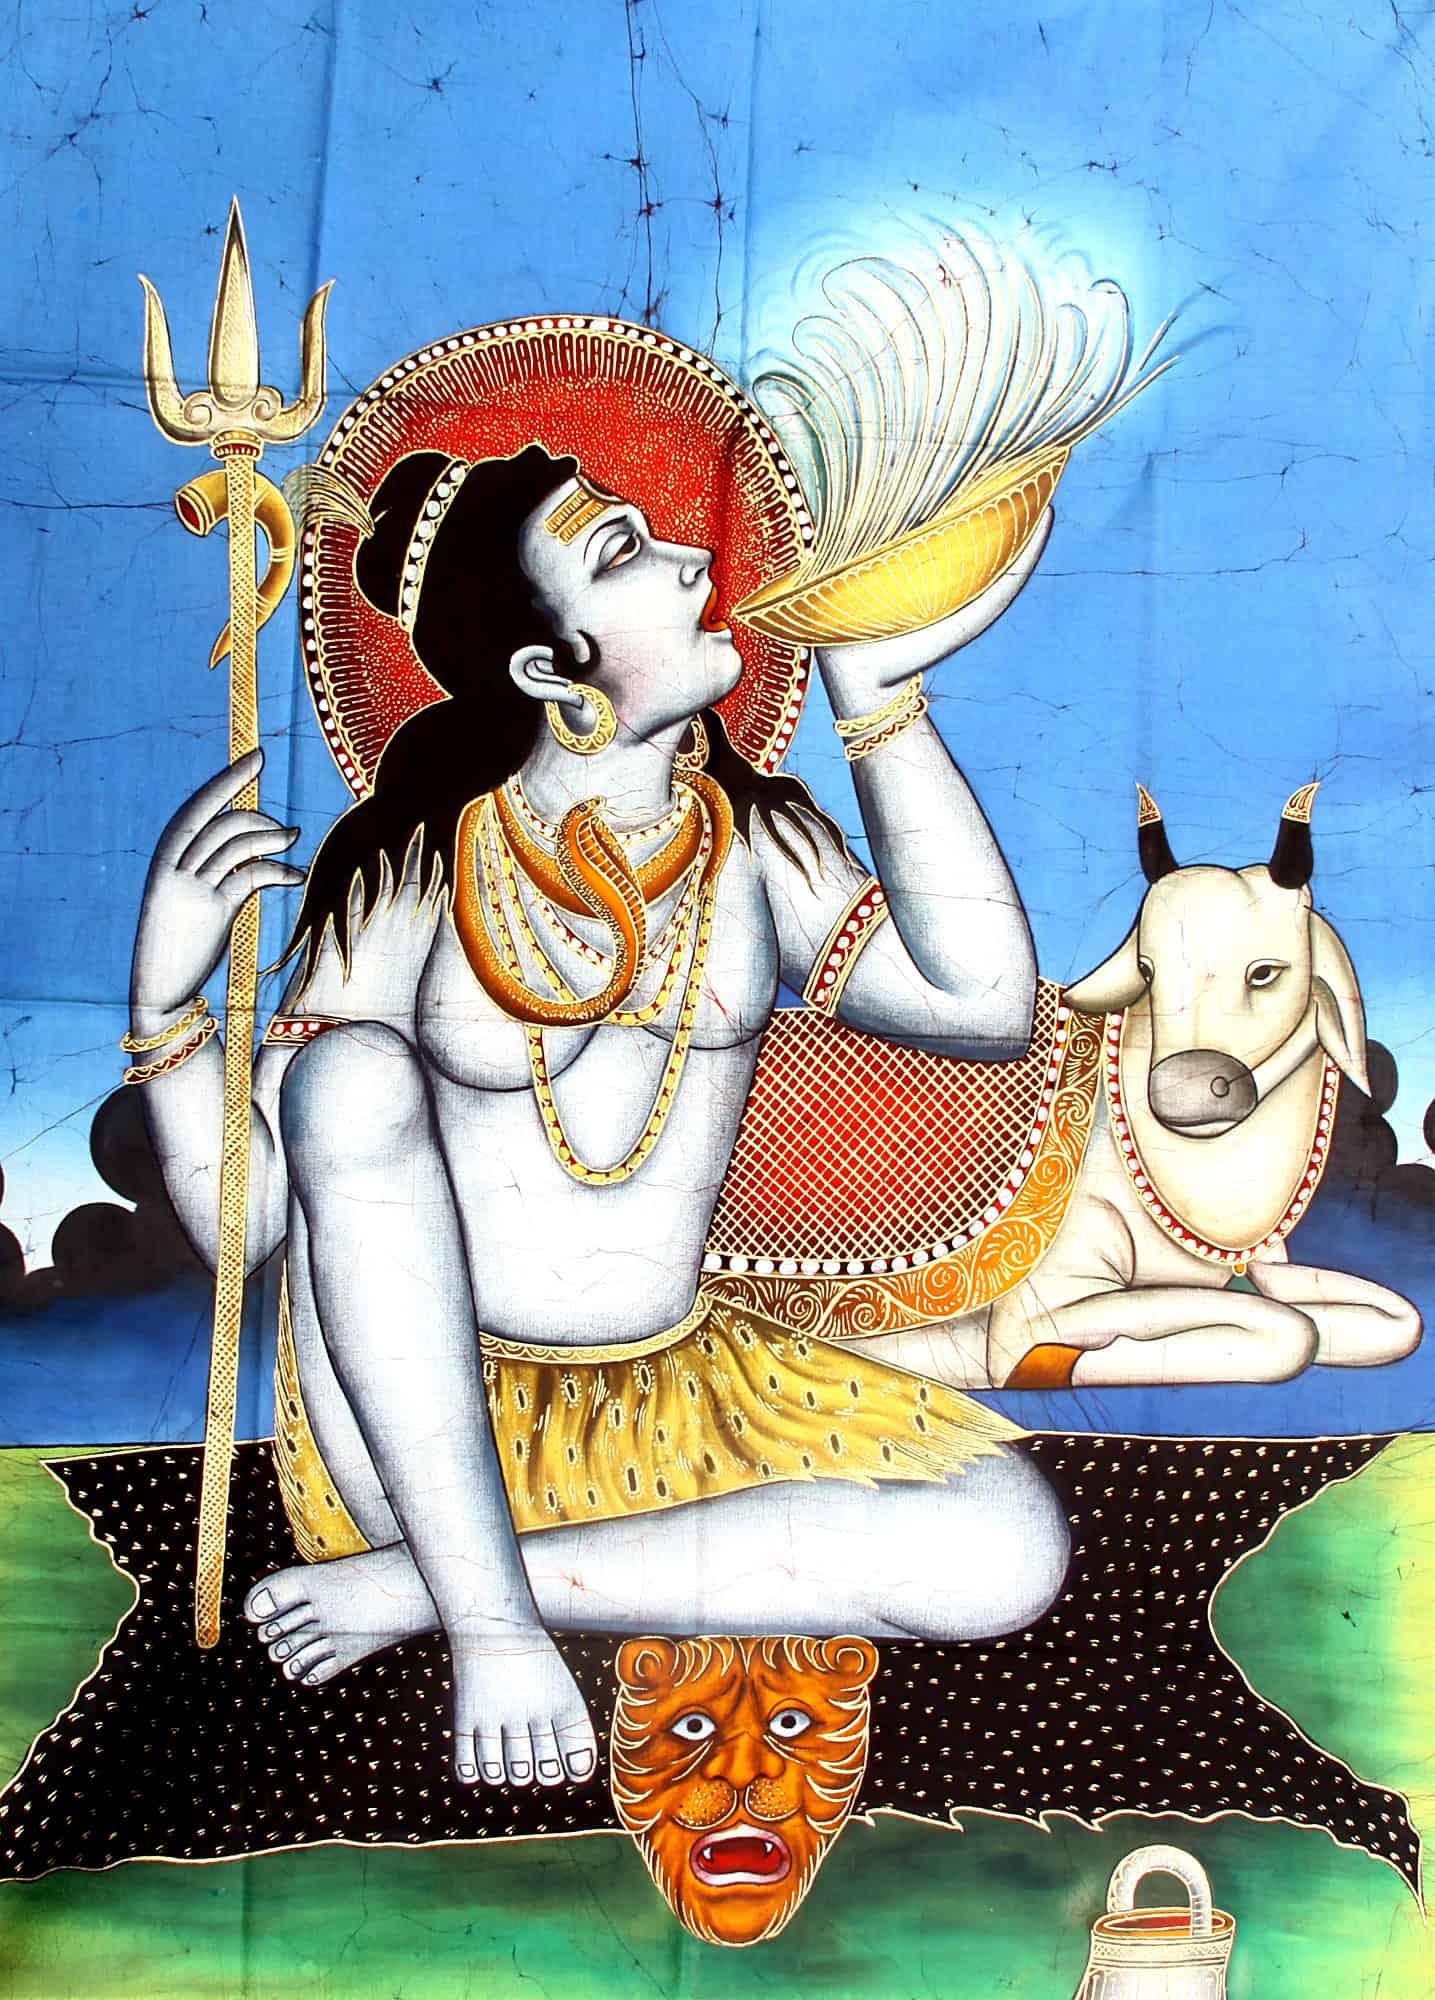 Kasa Indian Eatery - Shiva drinking Kasa bhang lassi